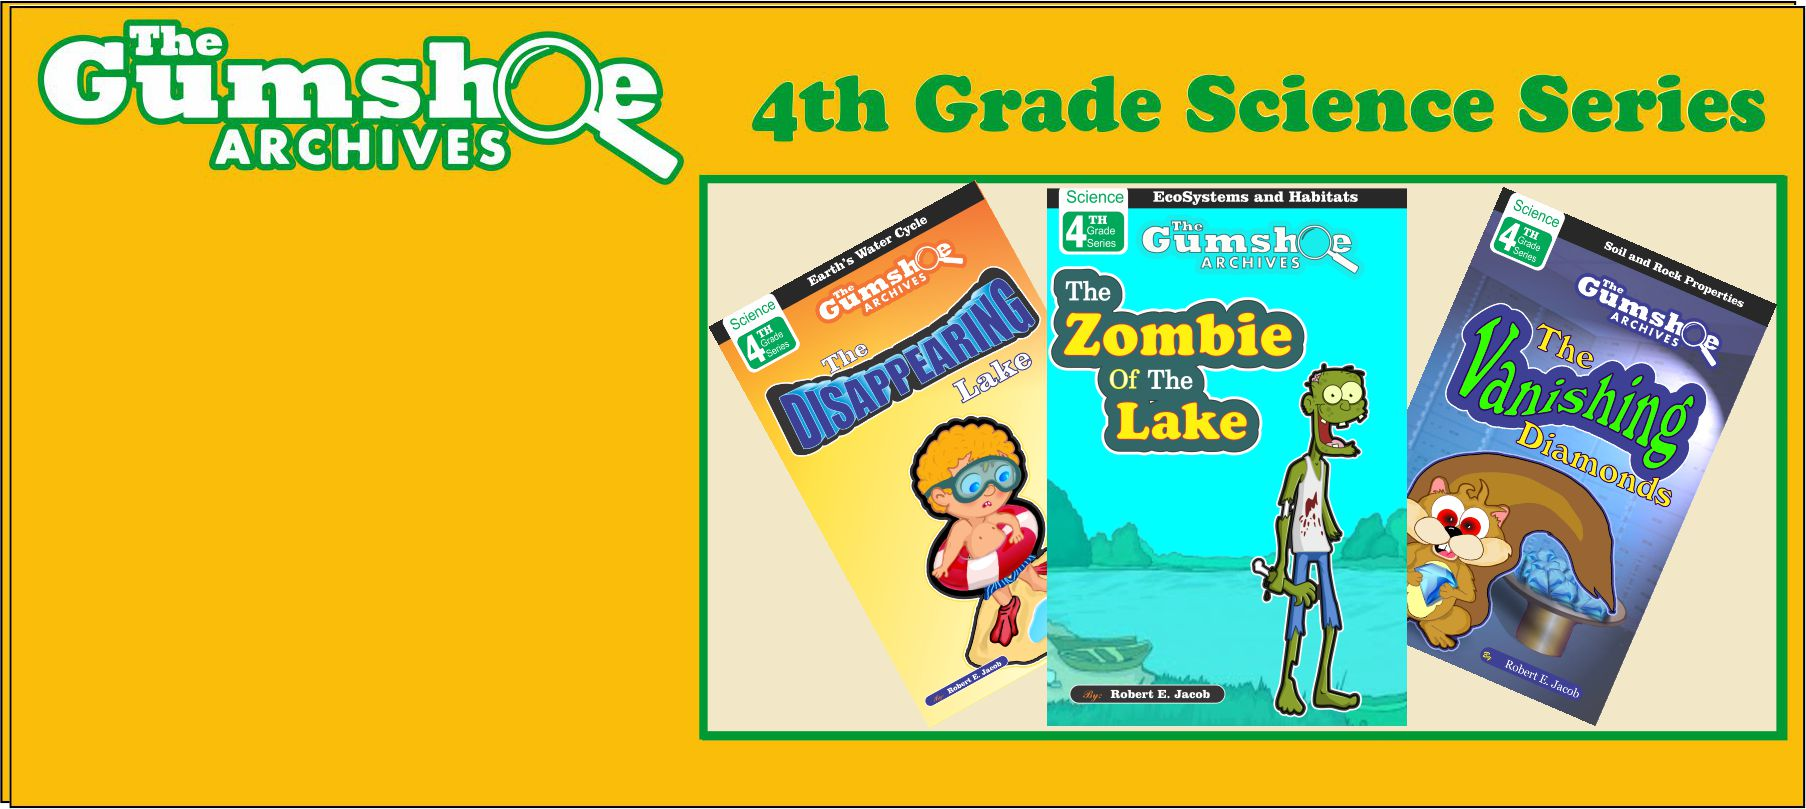 childrens science books 4th grade series